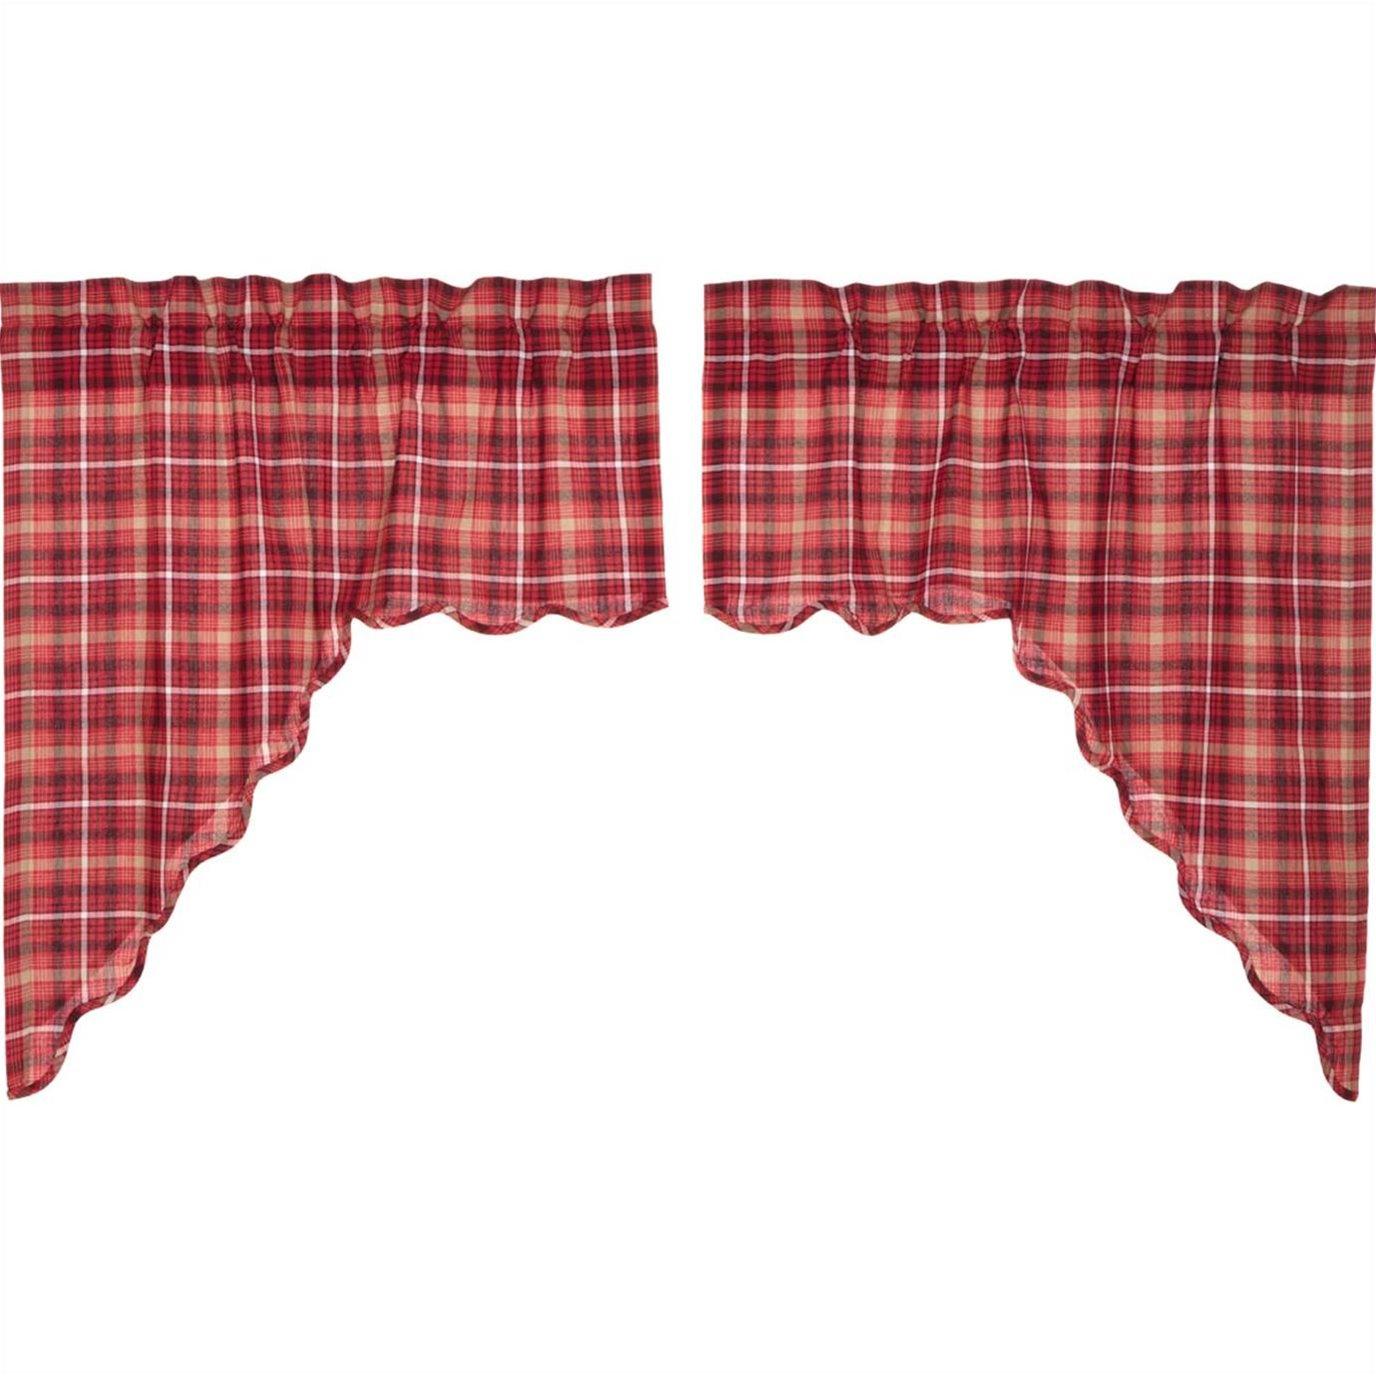 Braxton Scalloped Swag Set of 2 36x36x16